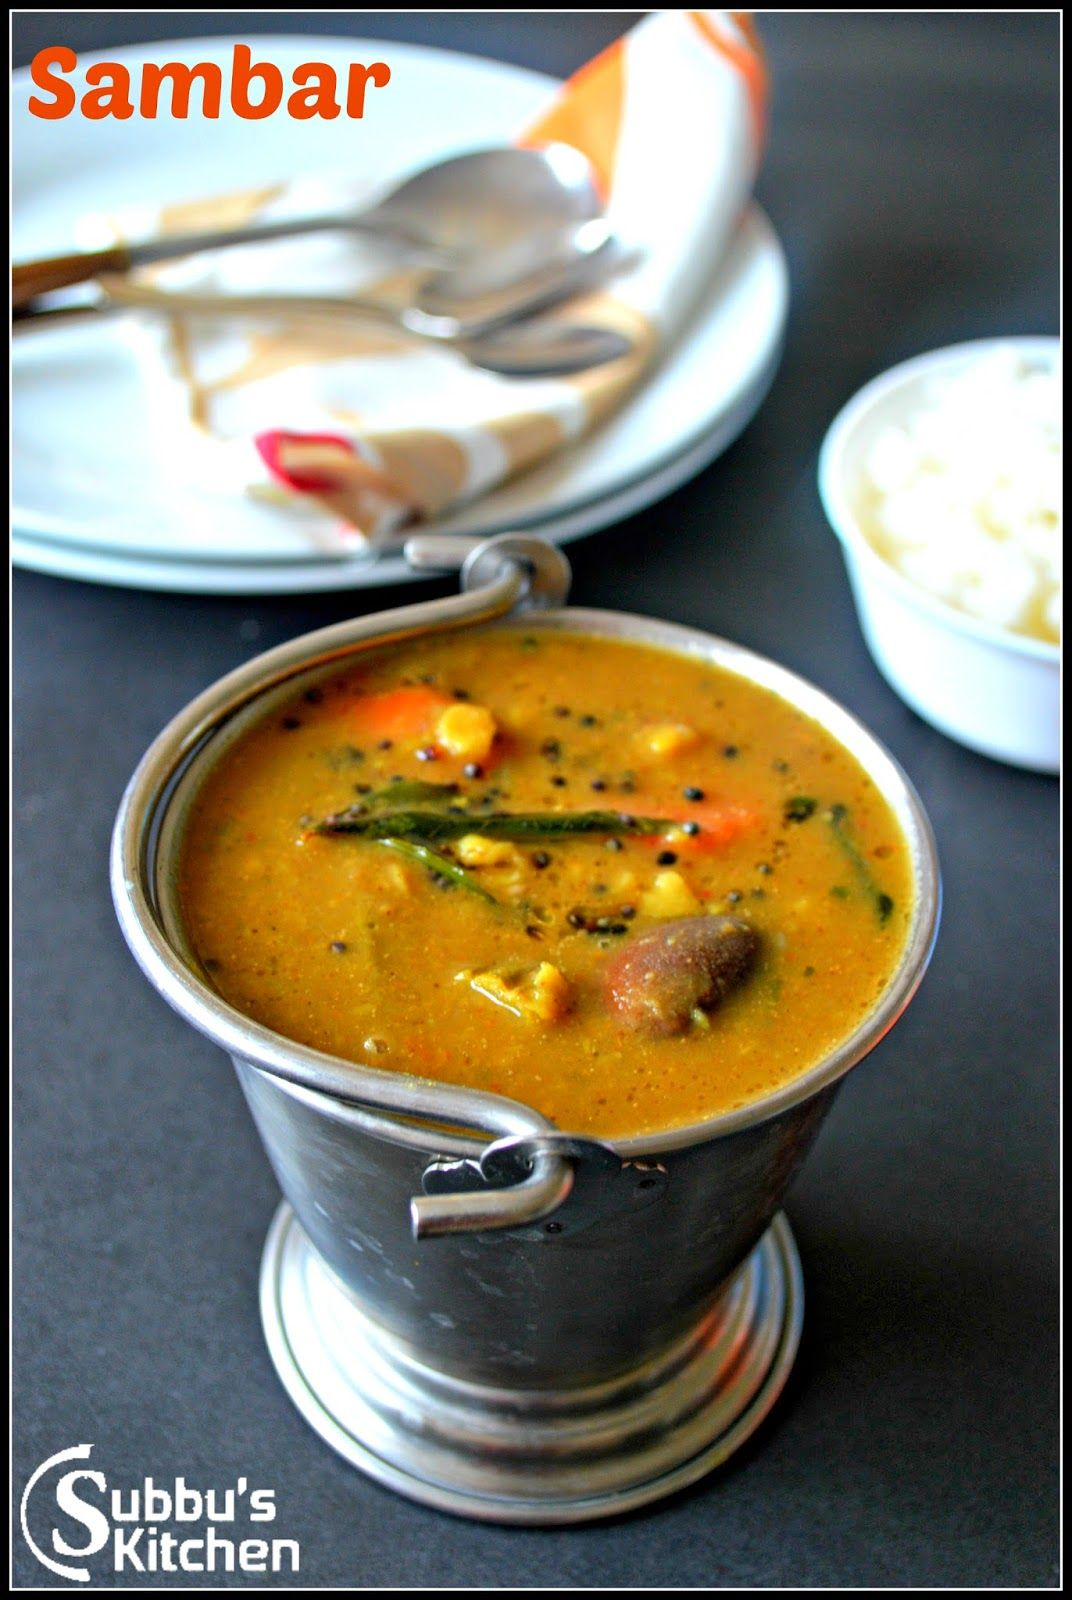 Subbus Kitchen Sambar Araithuvita Sambar Recipes Cooking Recipes Indian Cooking